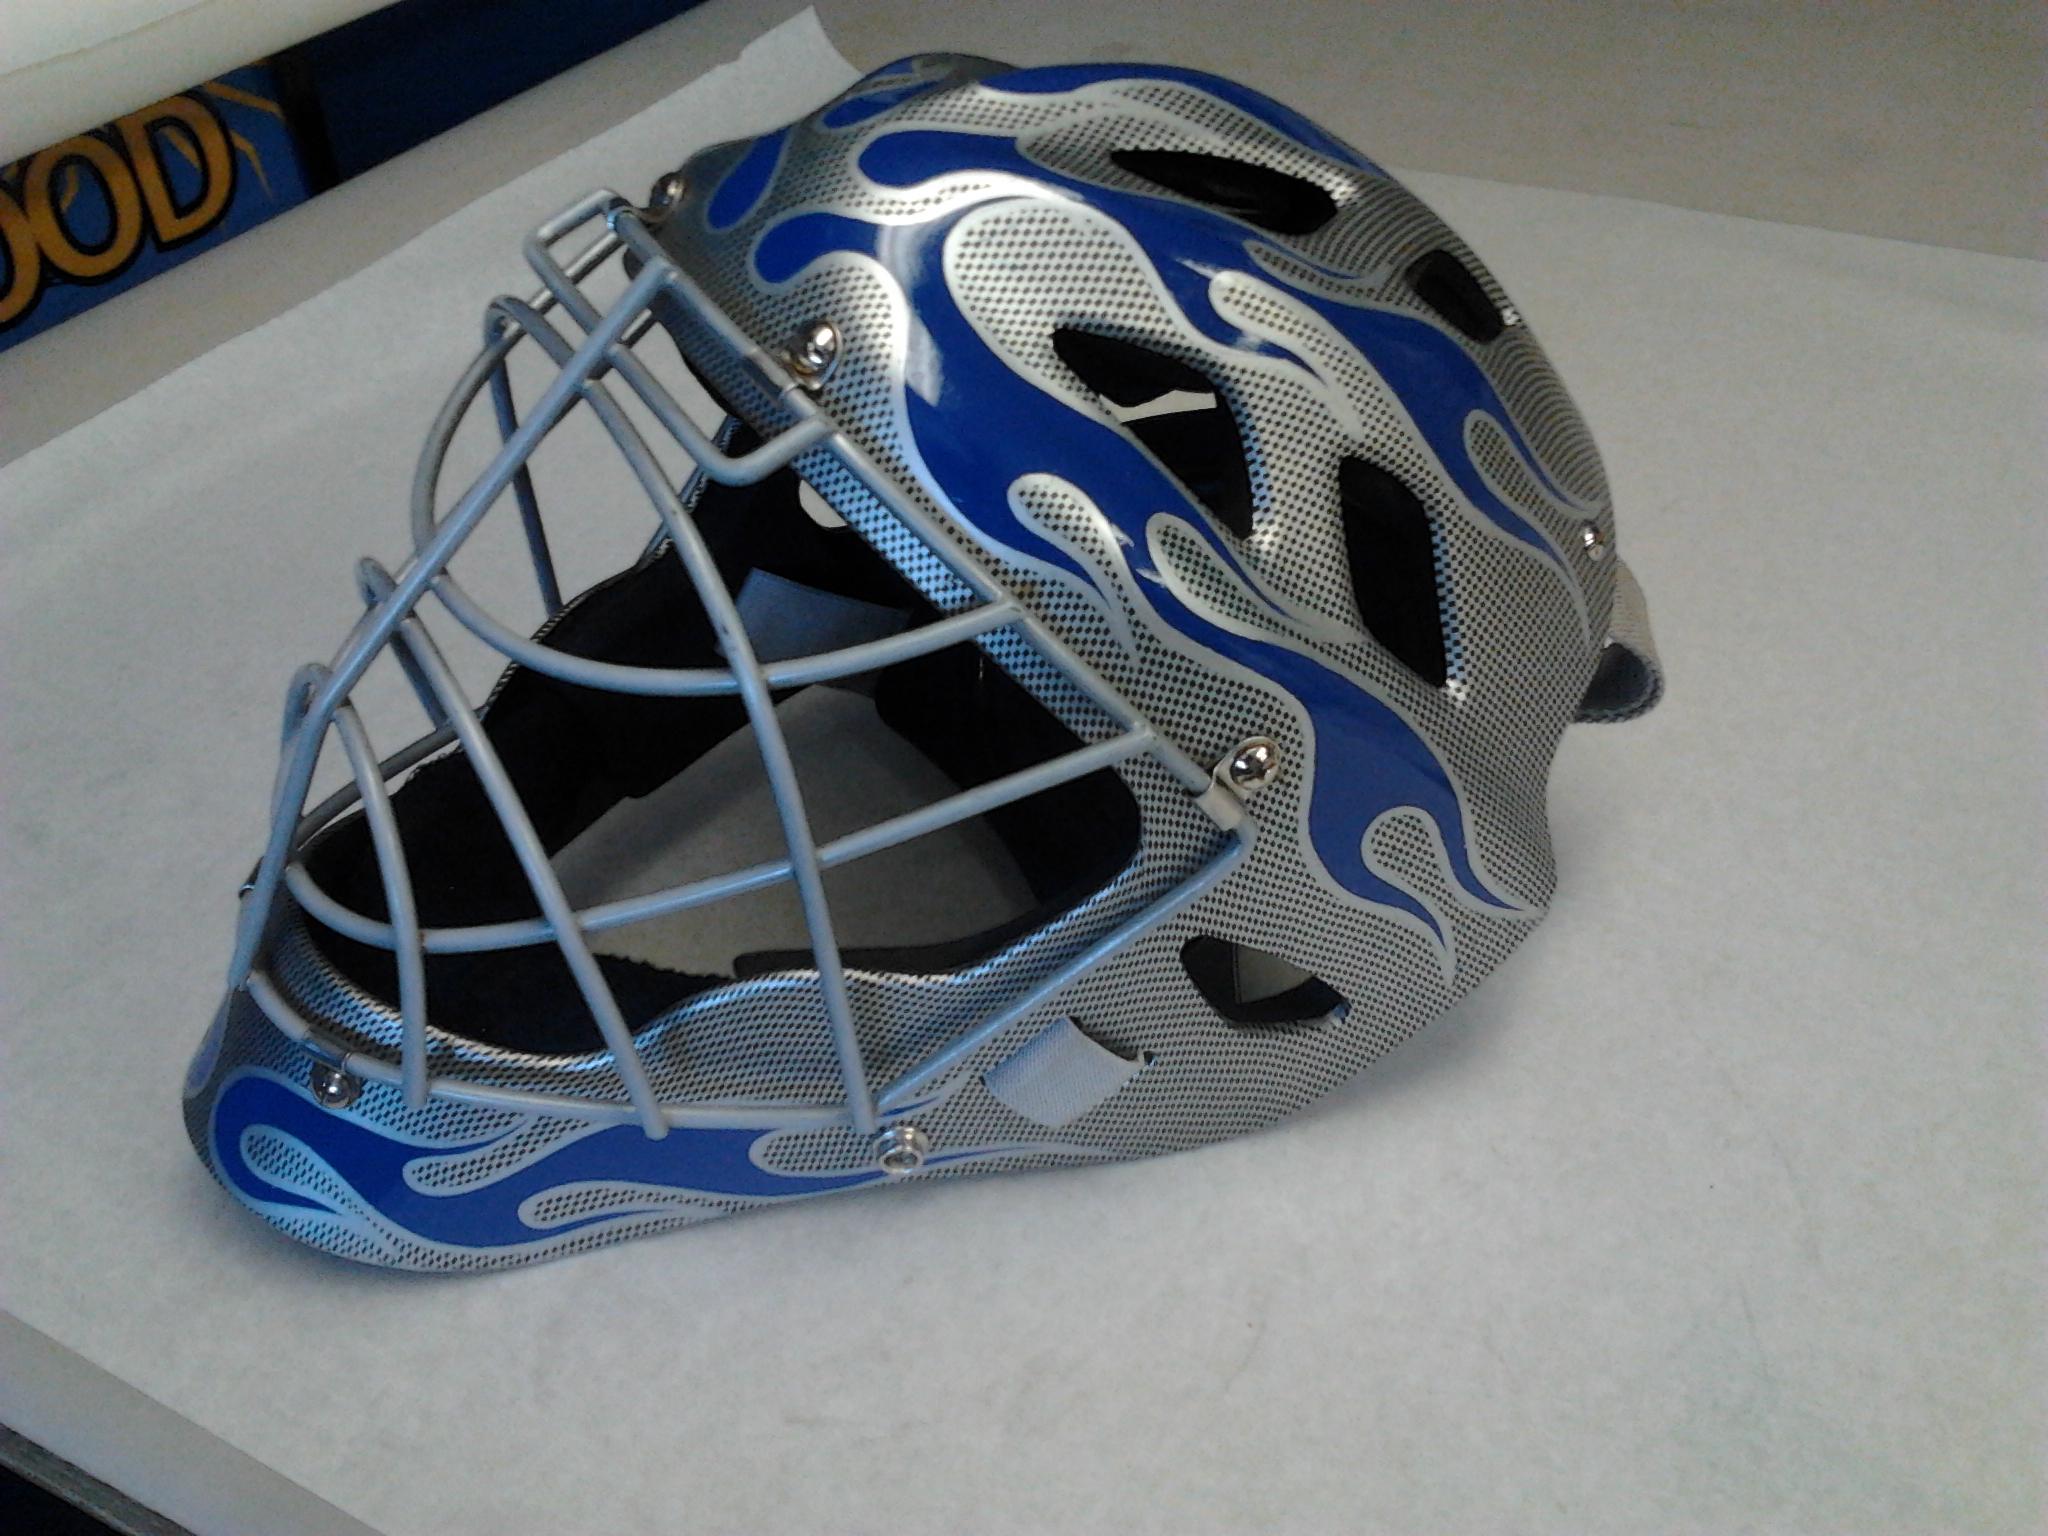 Hand Painted Helmet